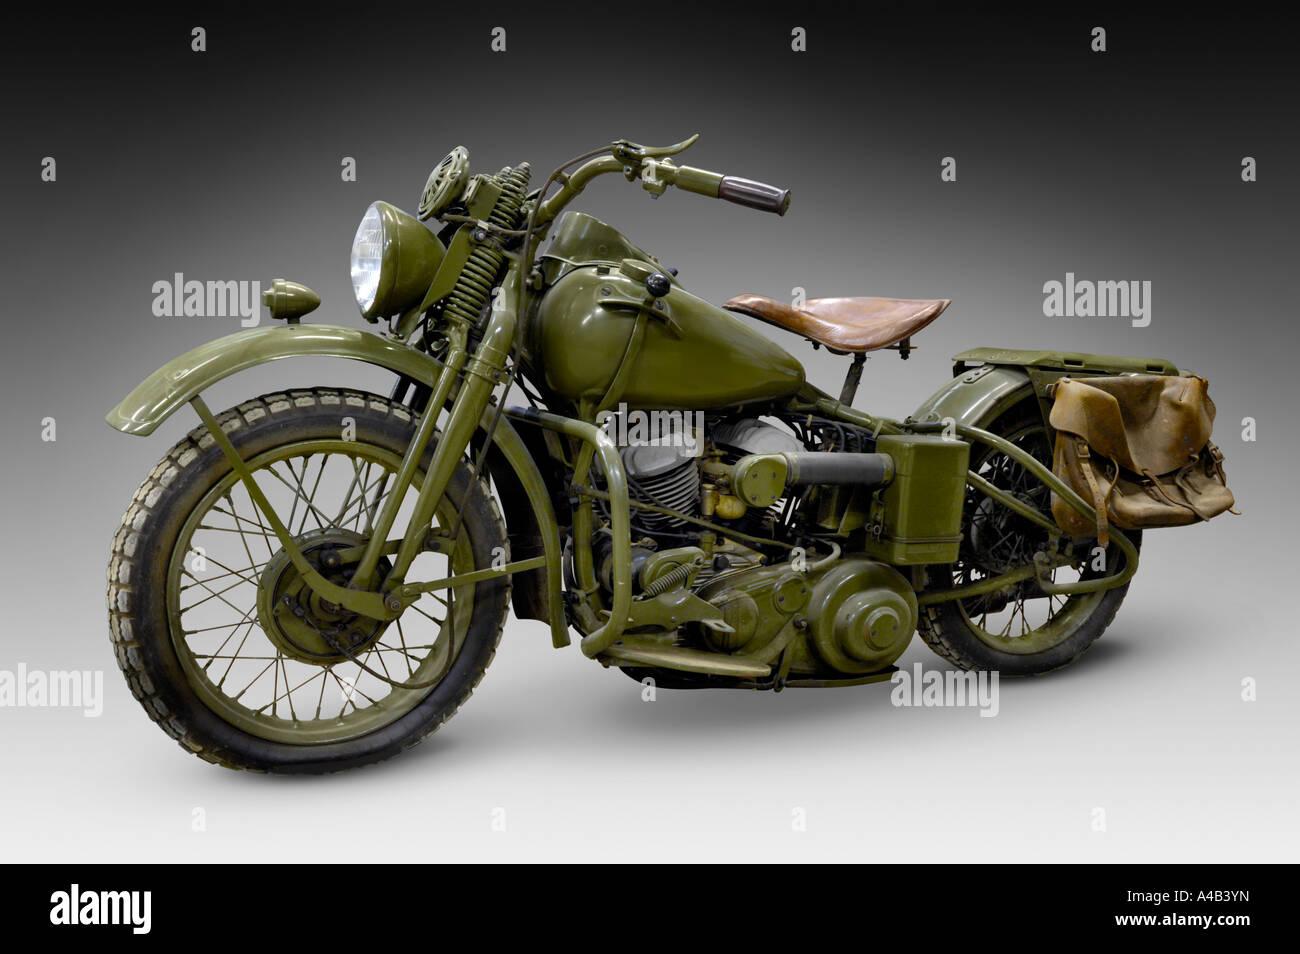 Buy Old Motorcycles